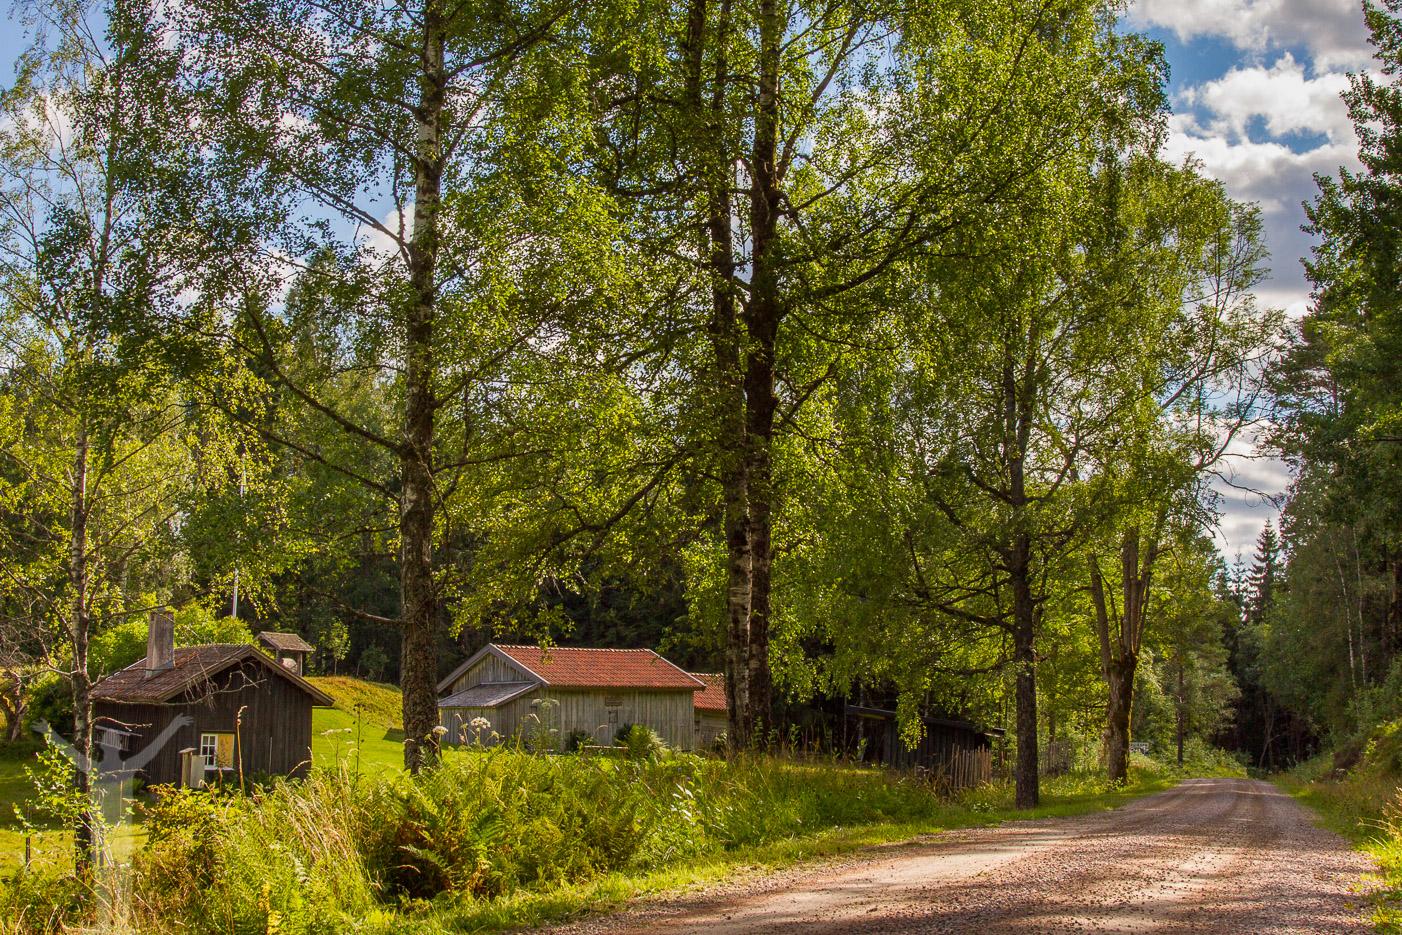 Grusväg i Dalsland